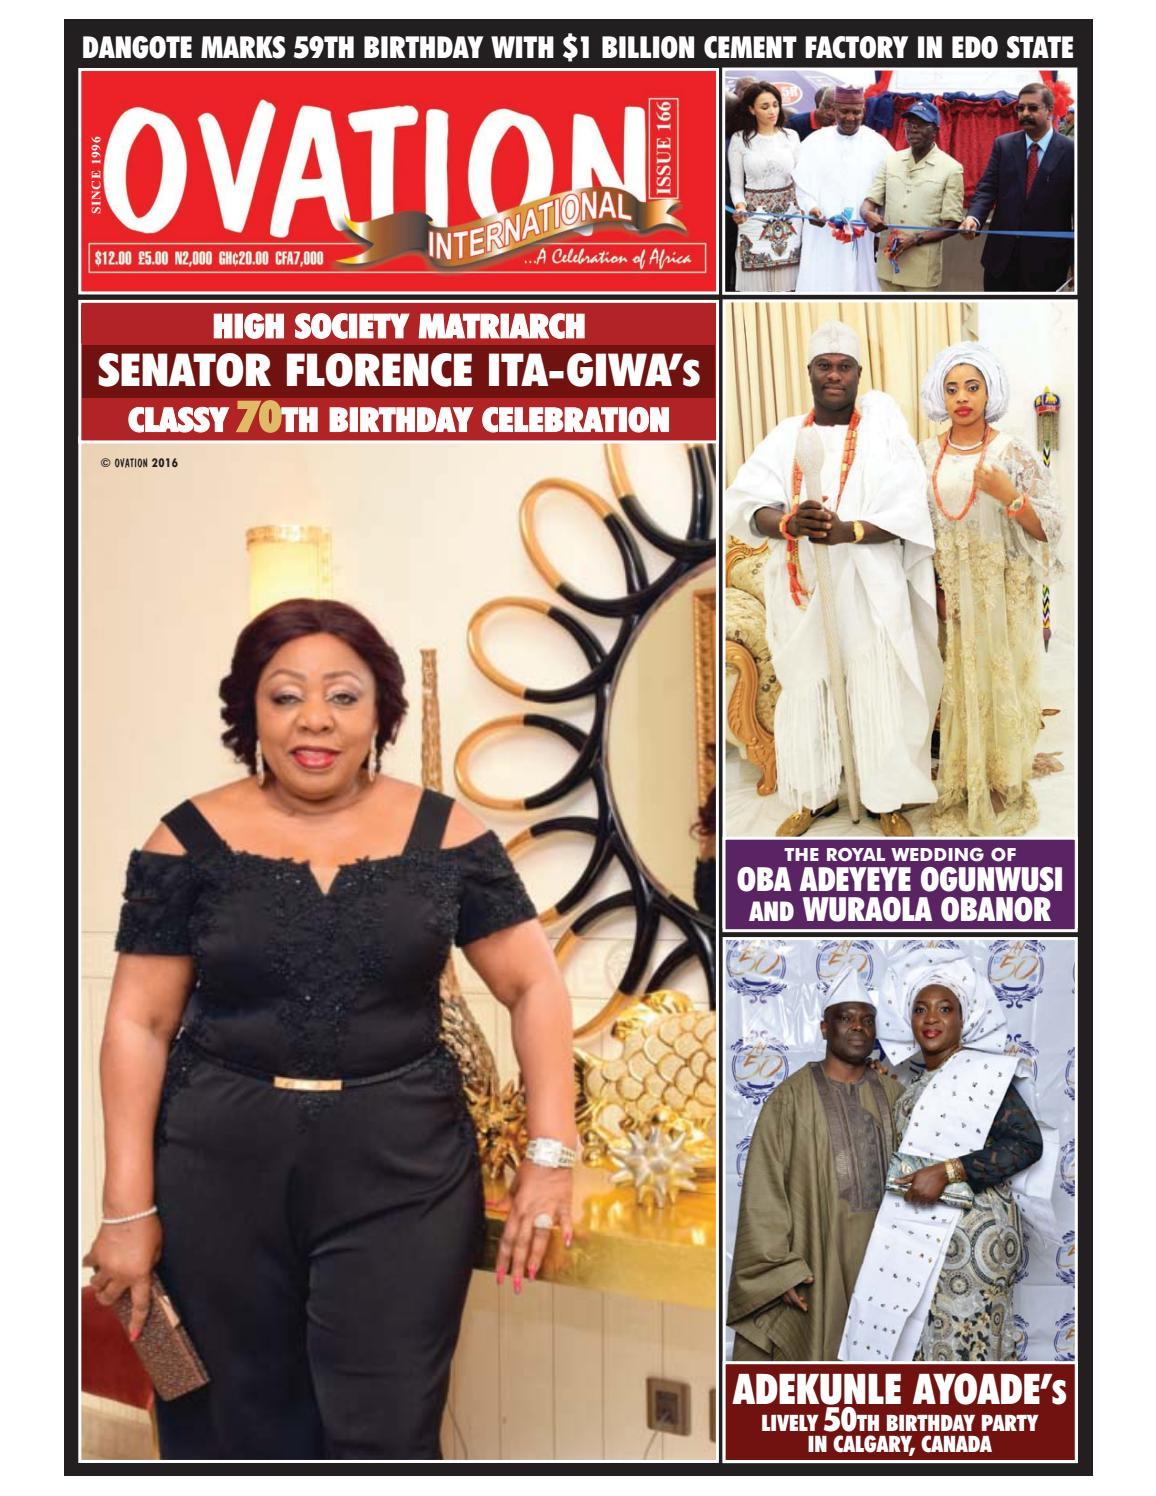 Ovation magazine issue 166 by t2eOvation - issuu